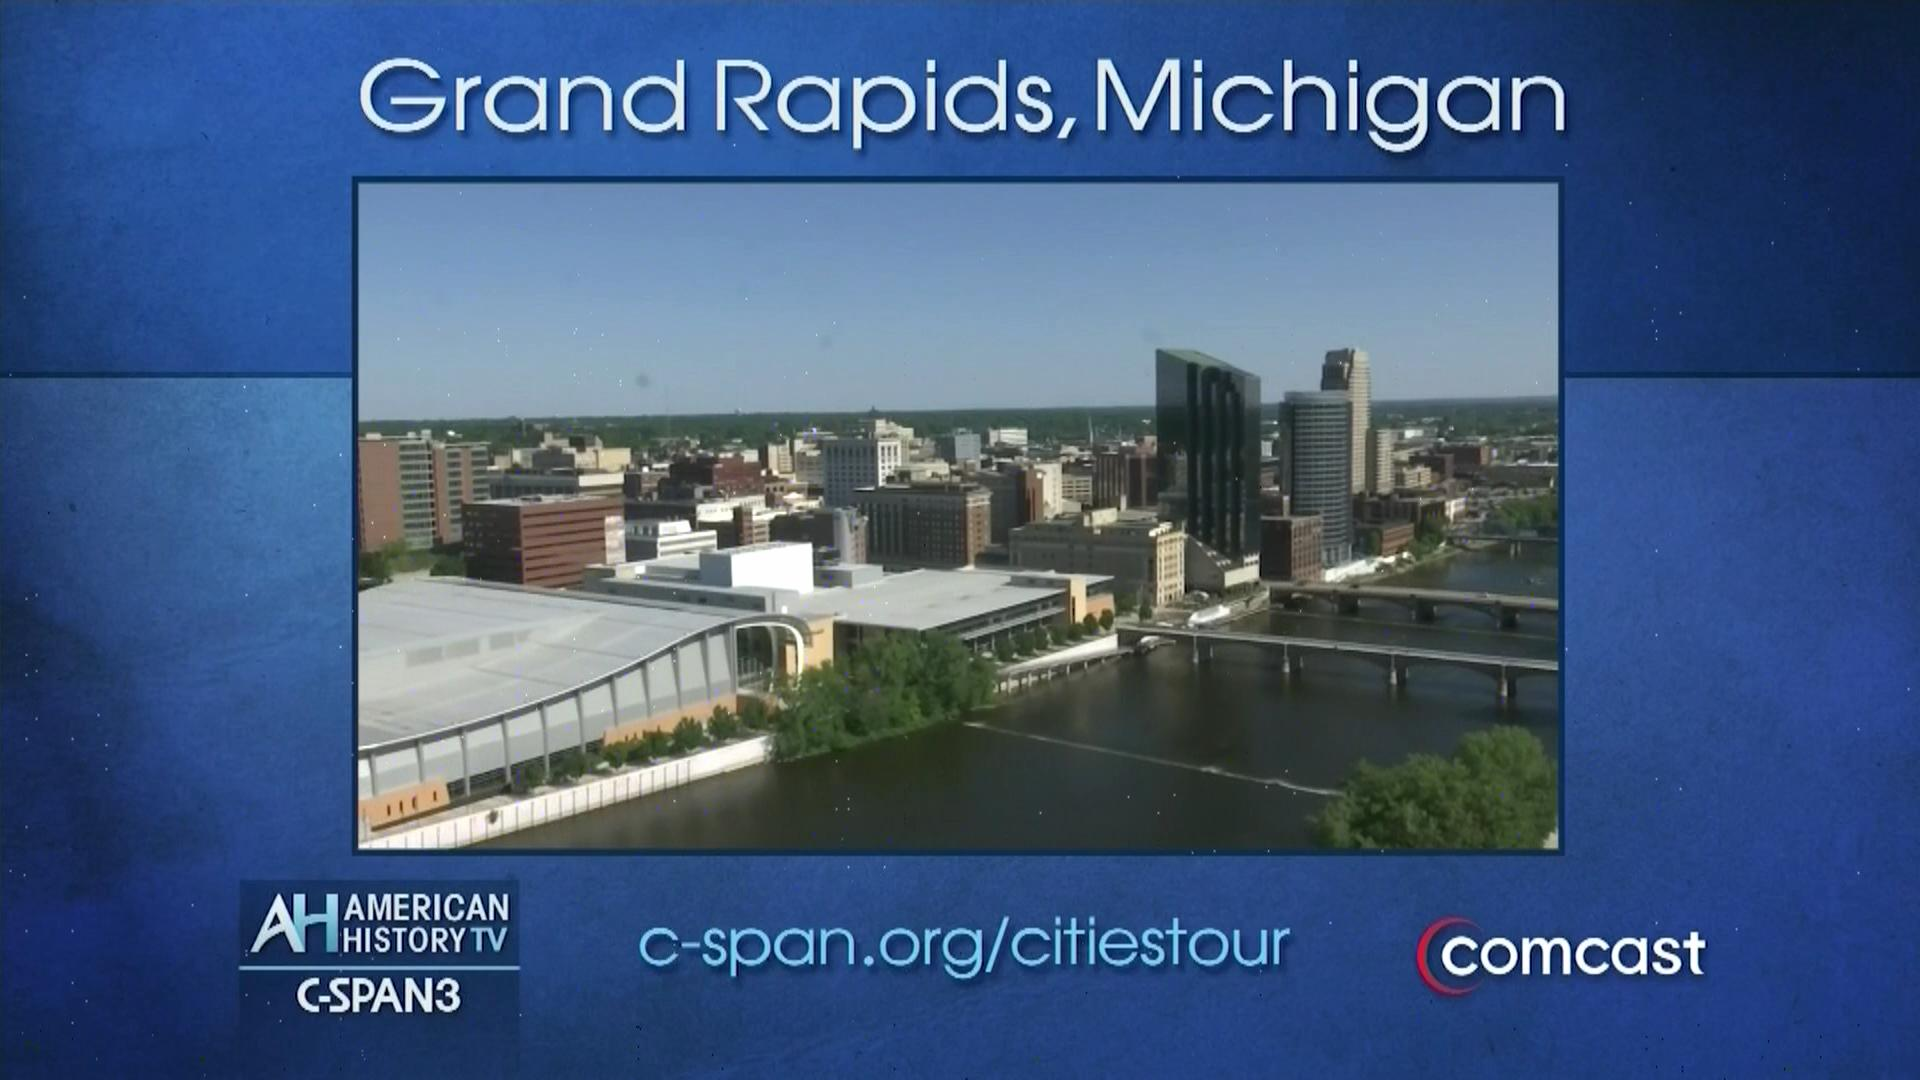 American history tv grand rapids michigan sep 18 2016 video c american history tv grand rapids michigan sep 18 2016 video c span solutioingenieria Gallery